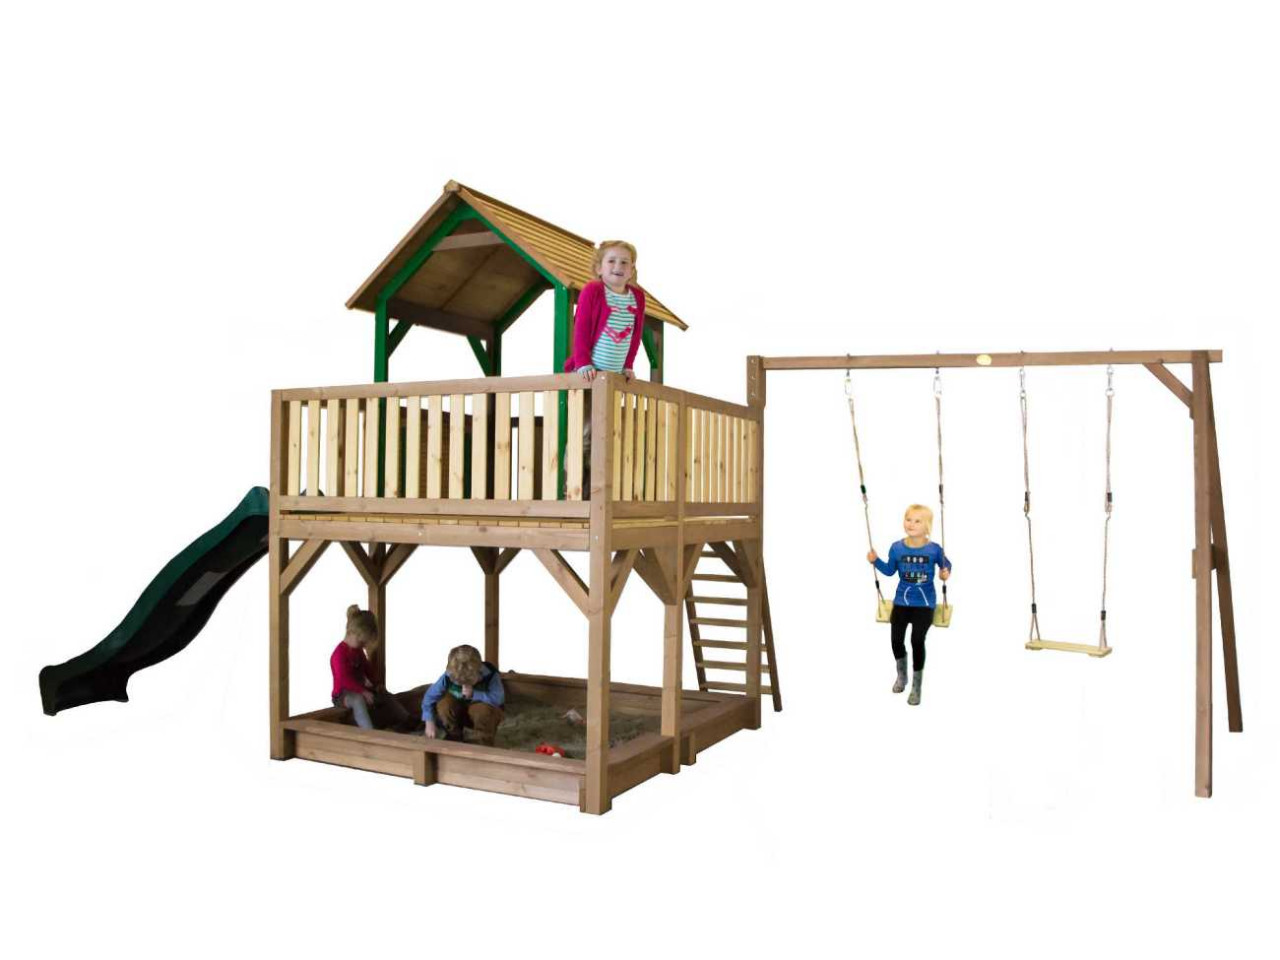 Spielturm Atka mit 2-Schaukel, Axi Spielturm, Kinder